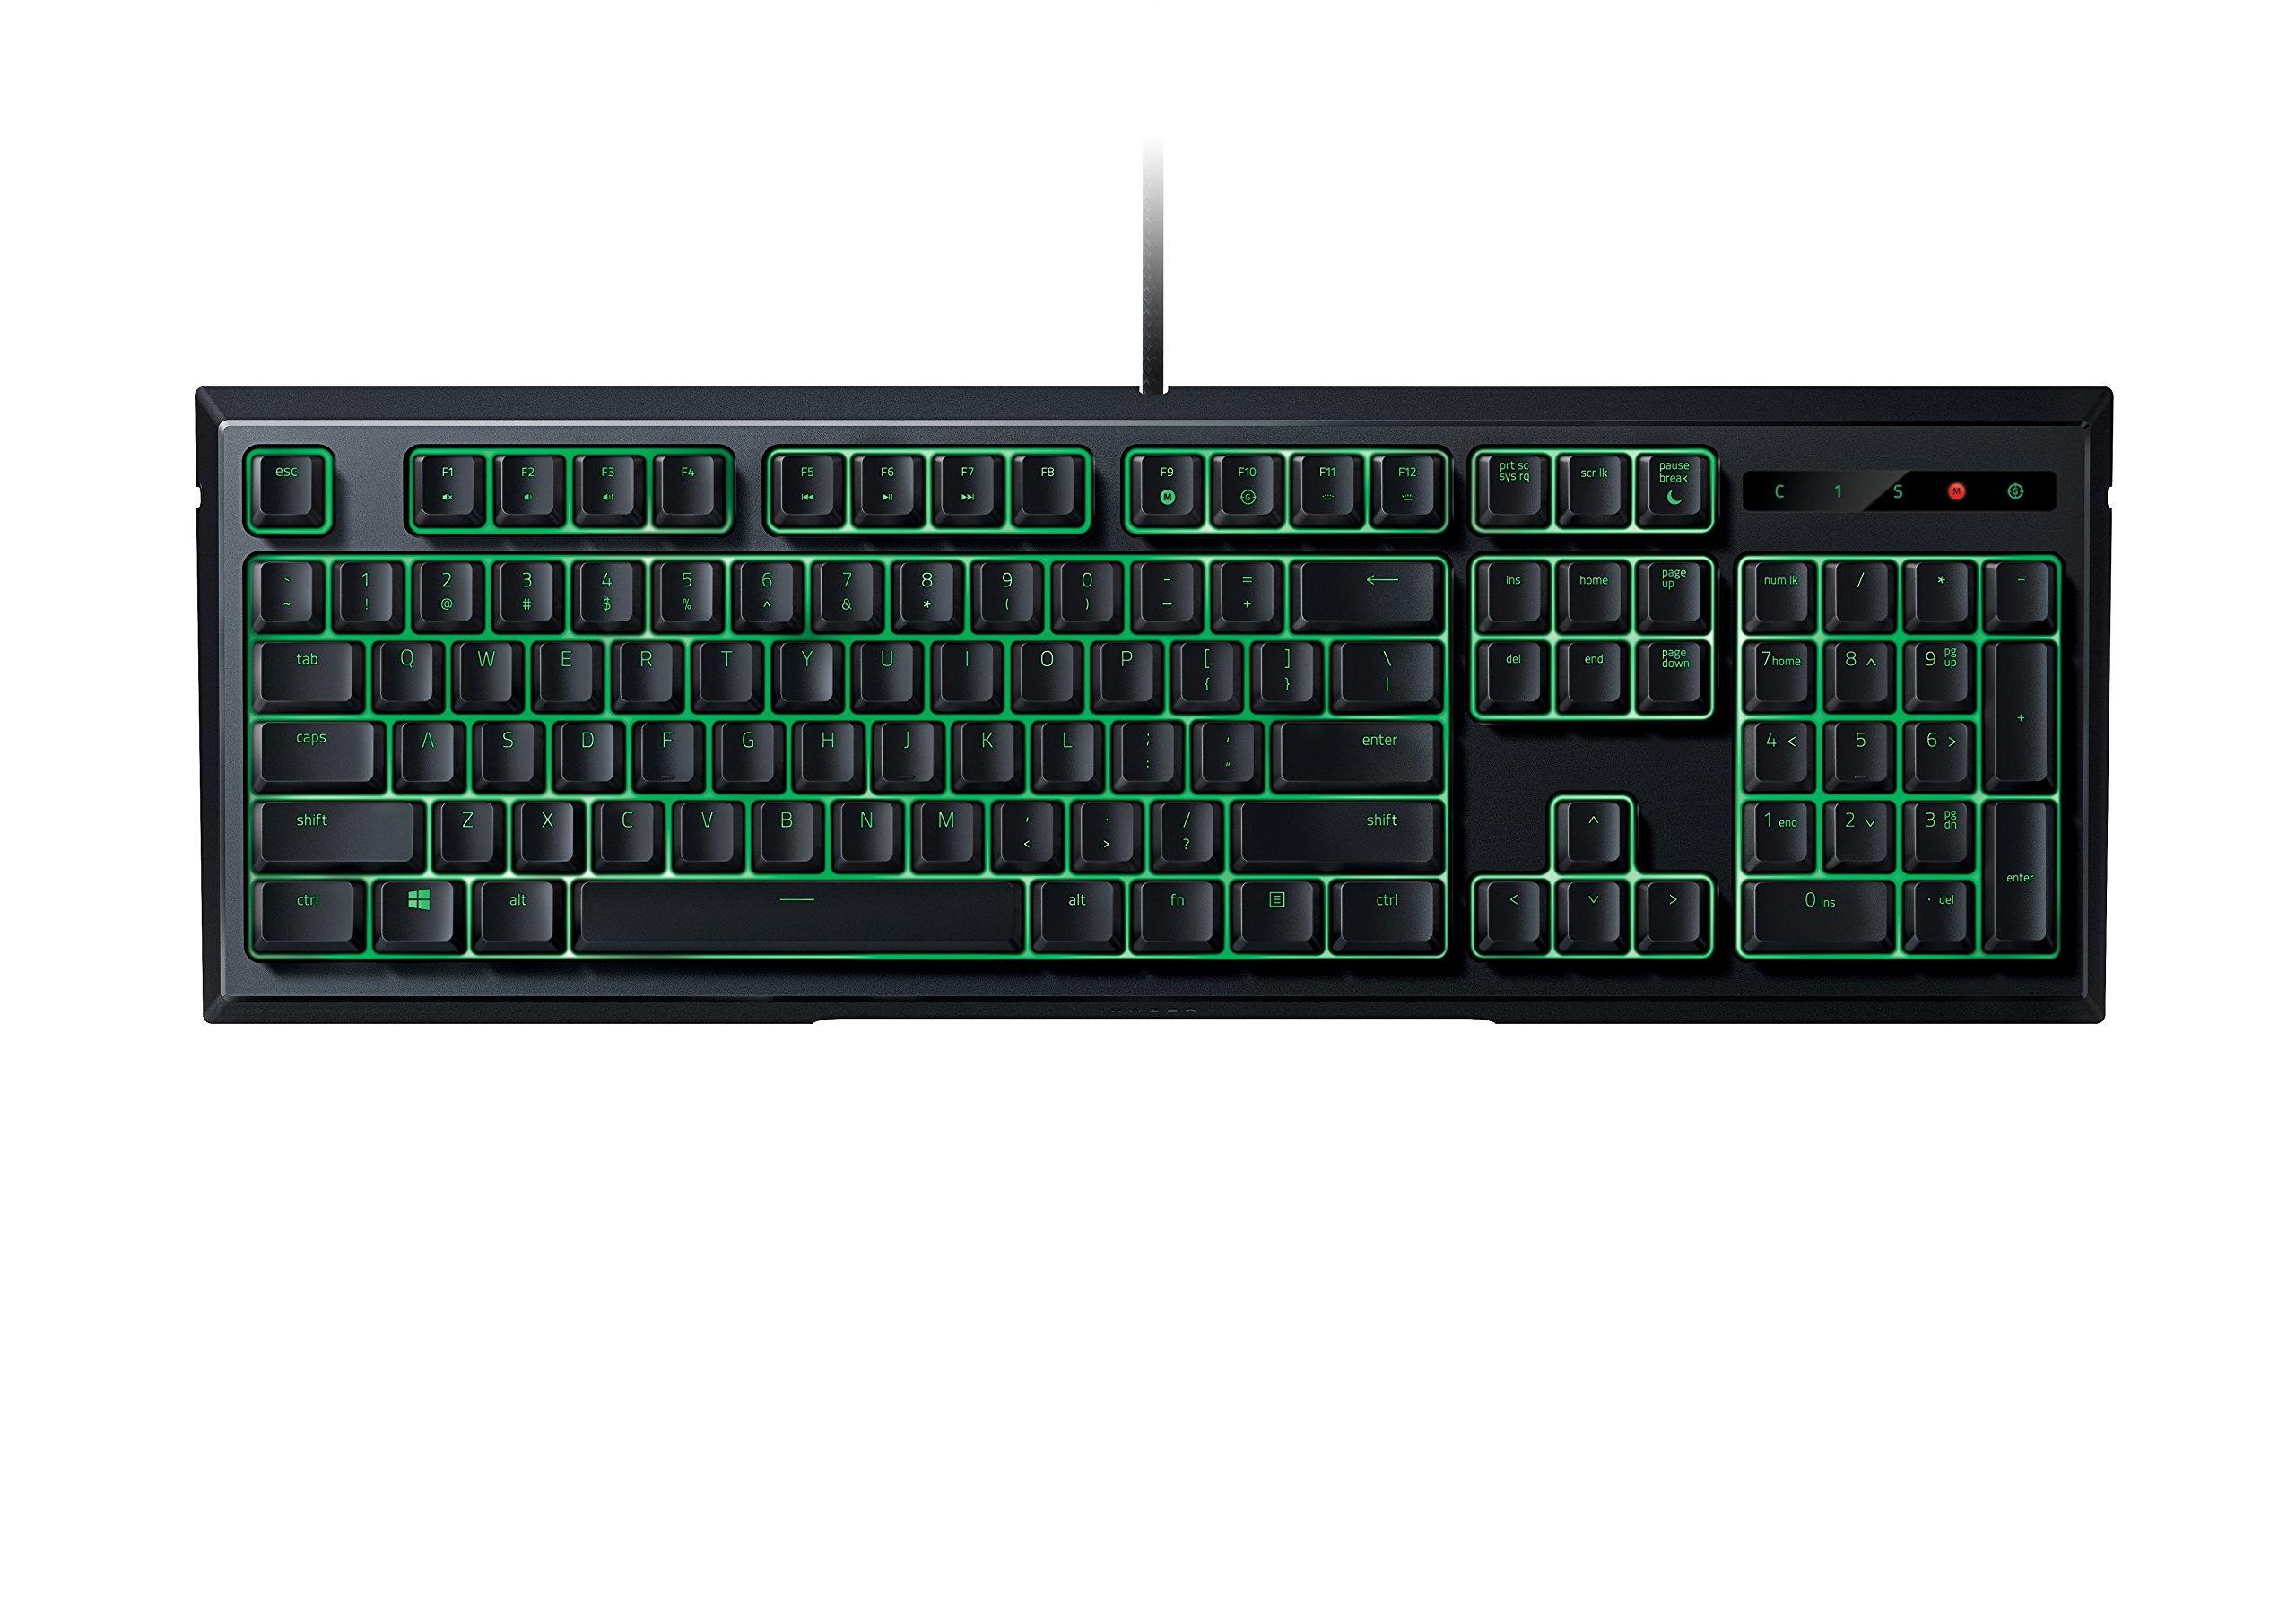 Razer Ornata Expert – Revolutionary Mecha-Membrane Gaming Keyboard with Mid-Height Keycaps - Wrist Rest - Ergonomic Design